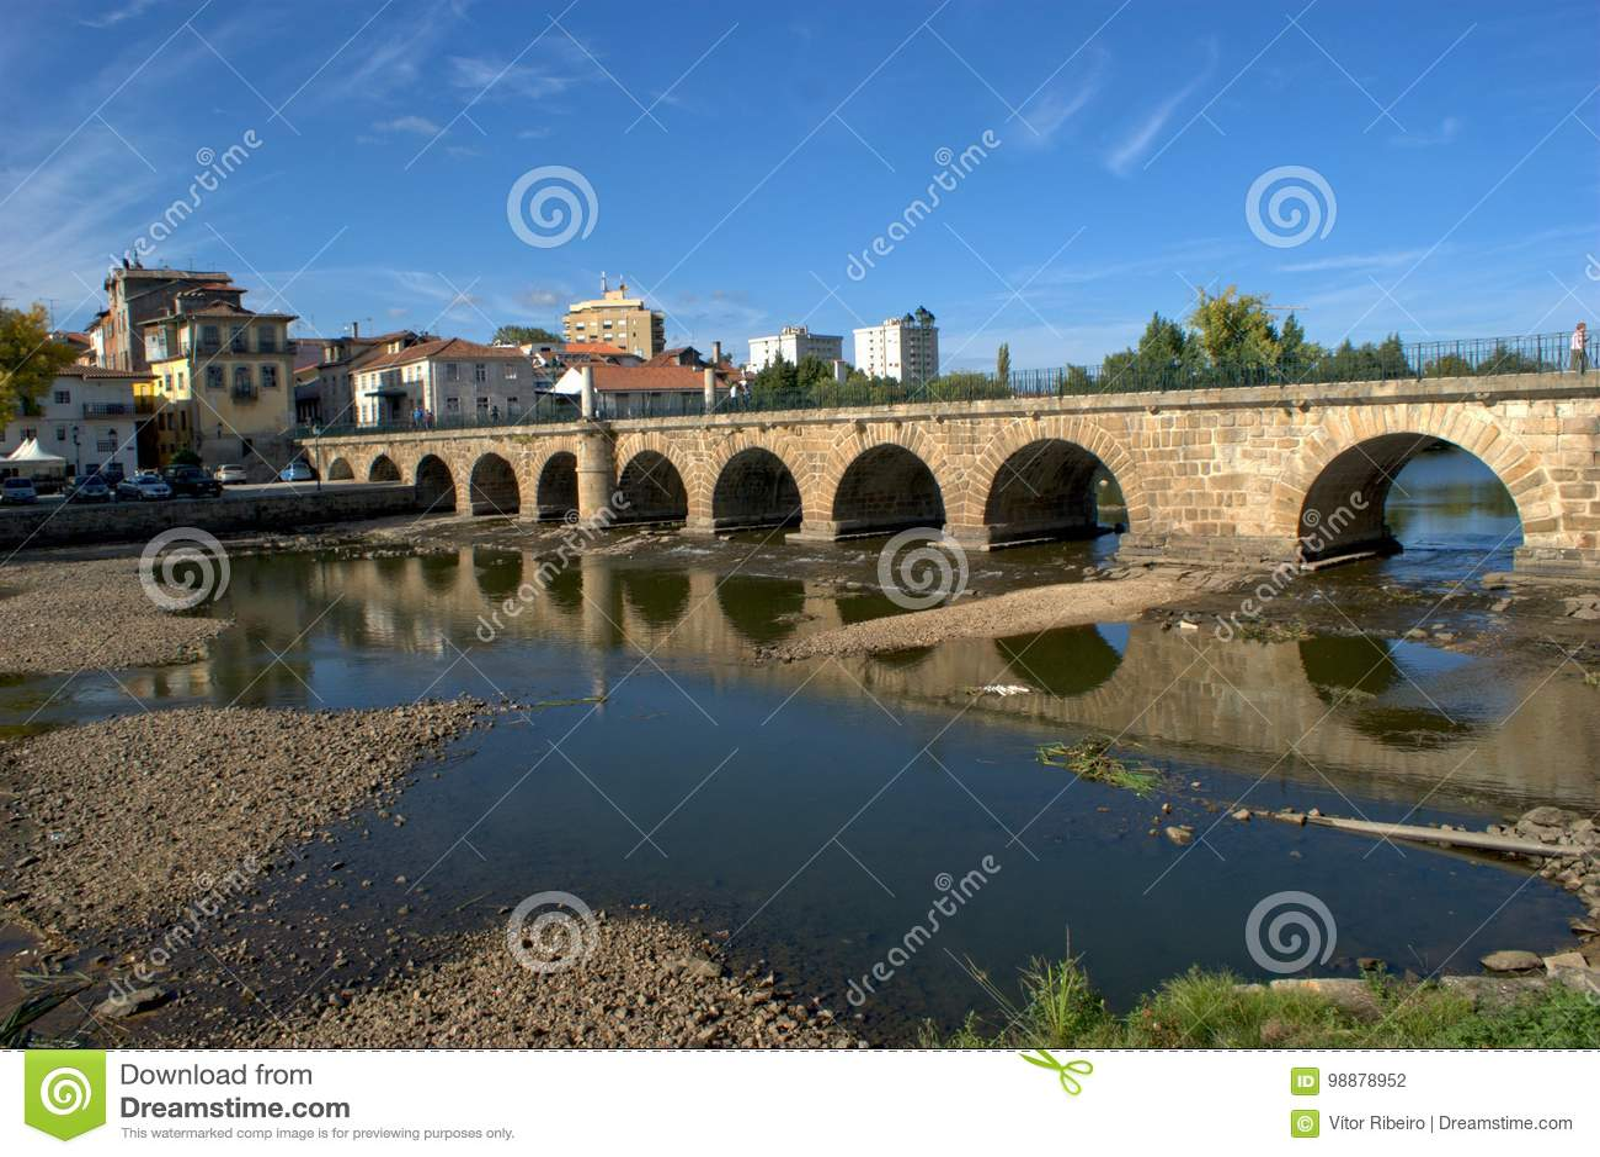 Roman bridge of Trajano